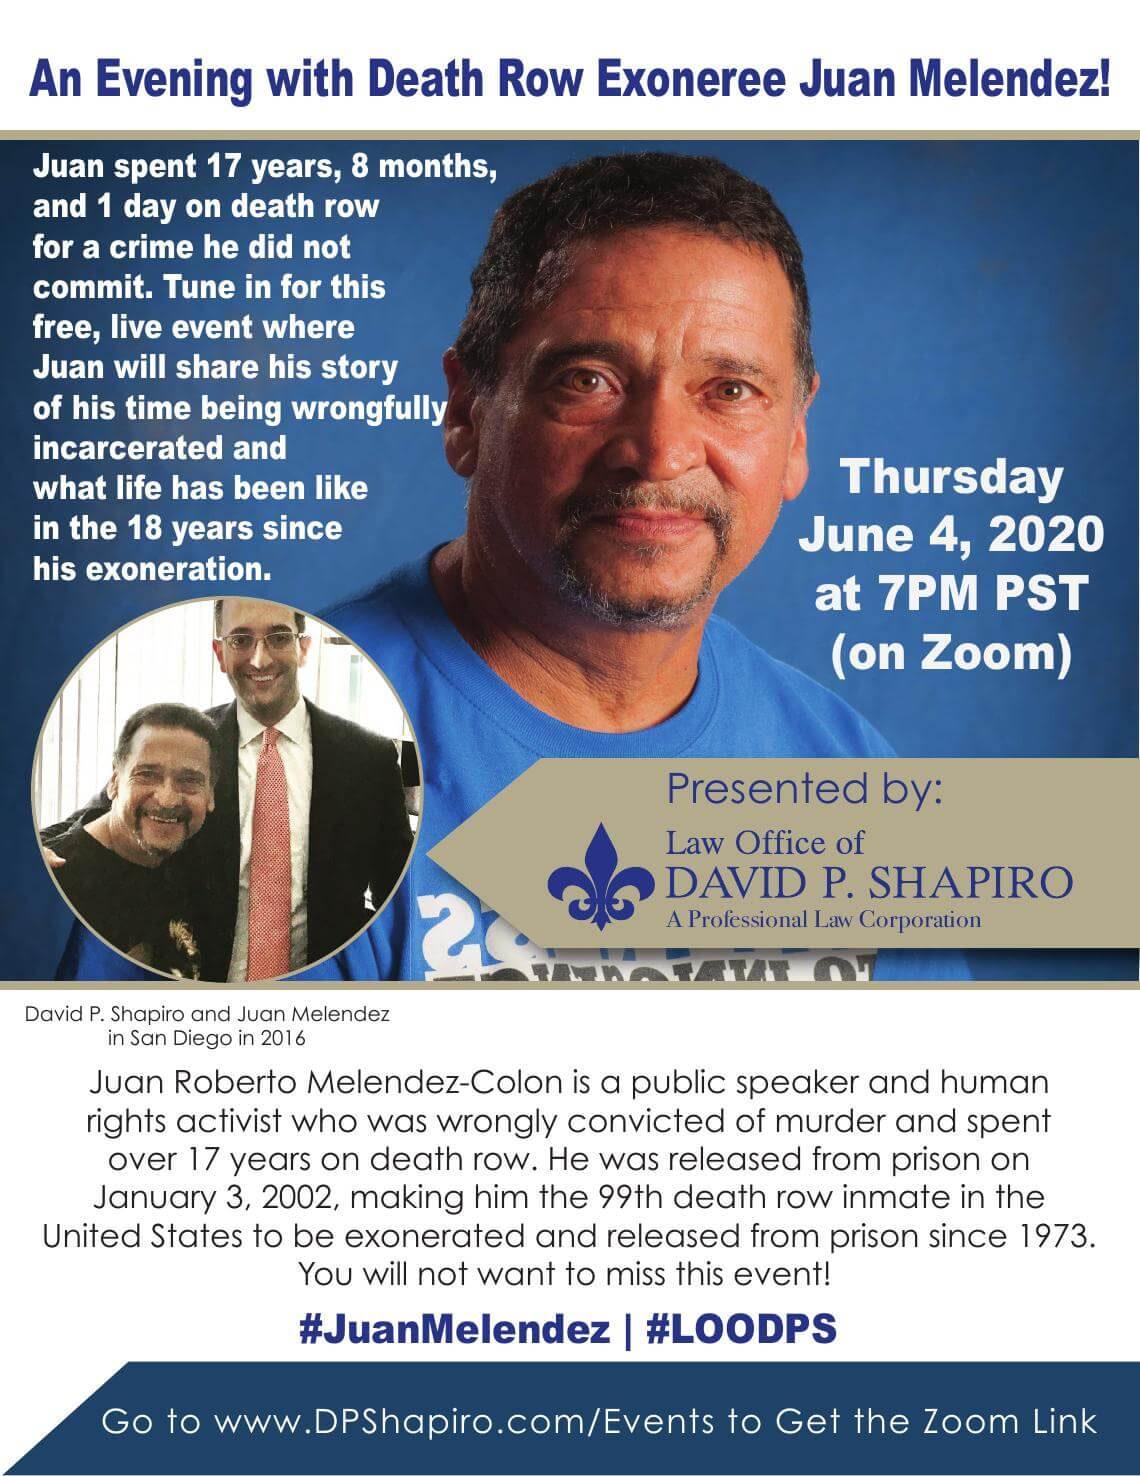 Juan Melendez June 4 Event